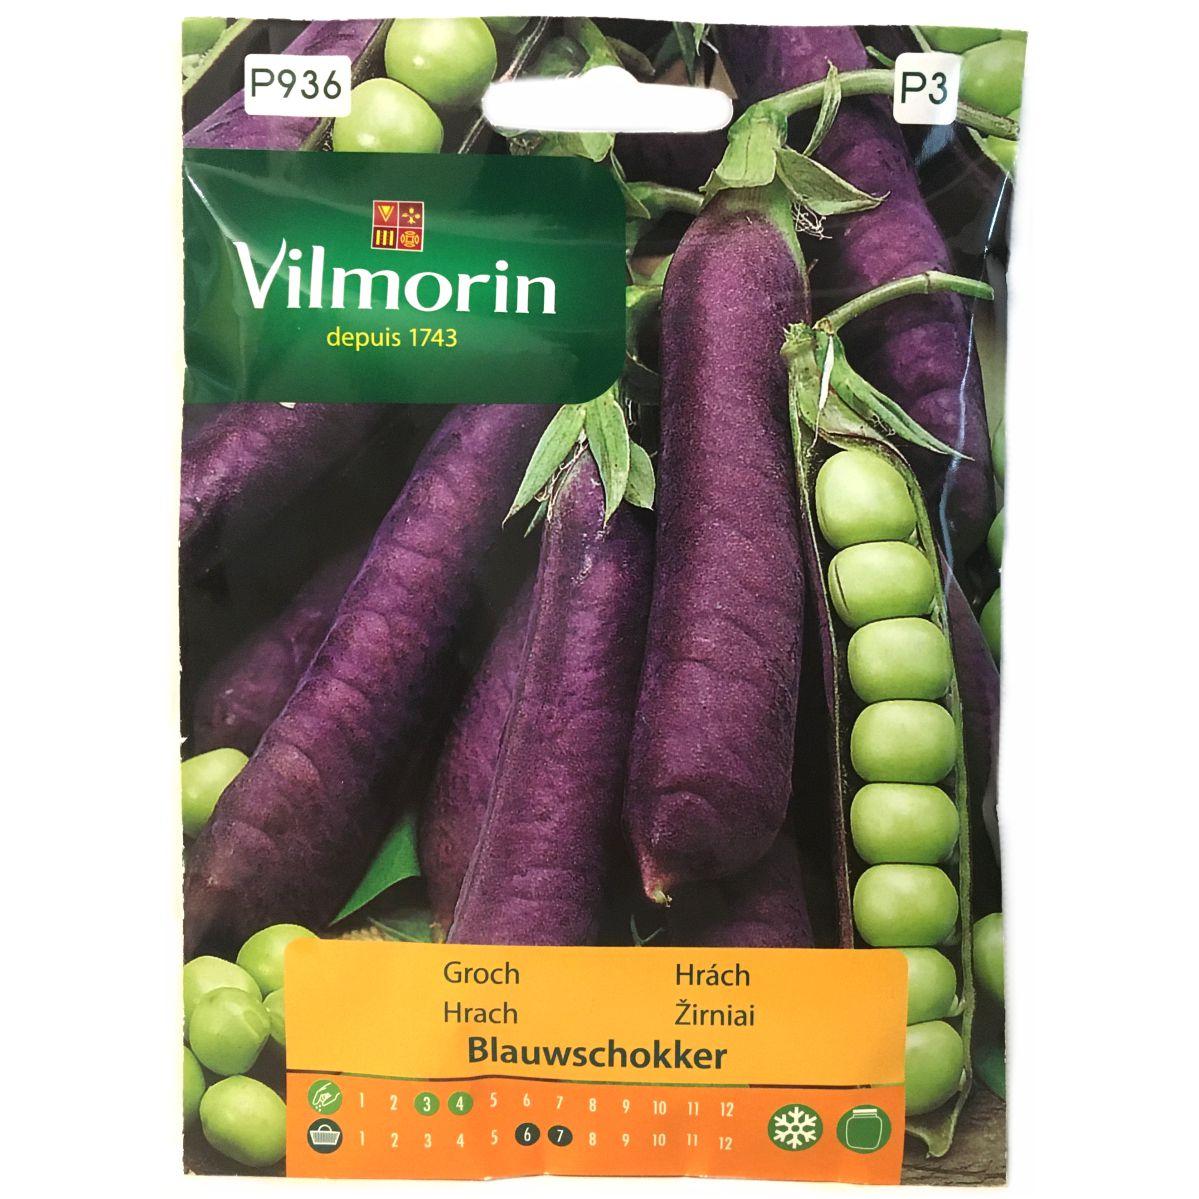 Groch Blauwschokker nasiona Vilmorin